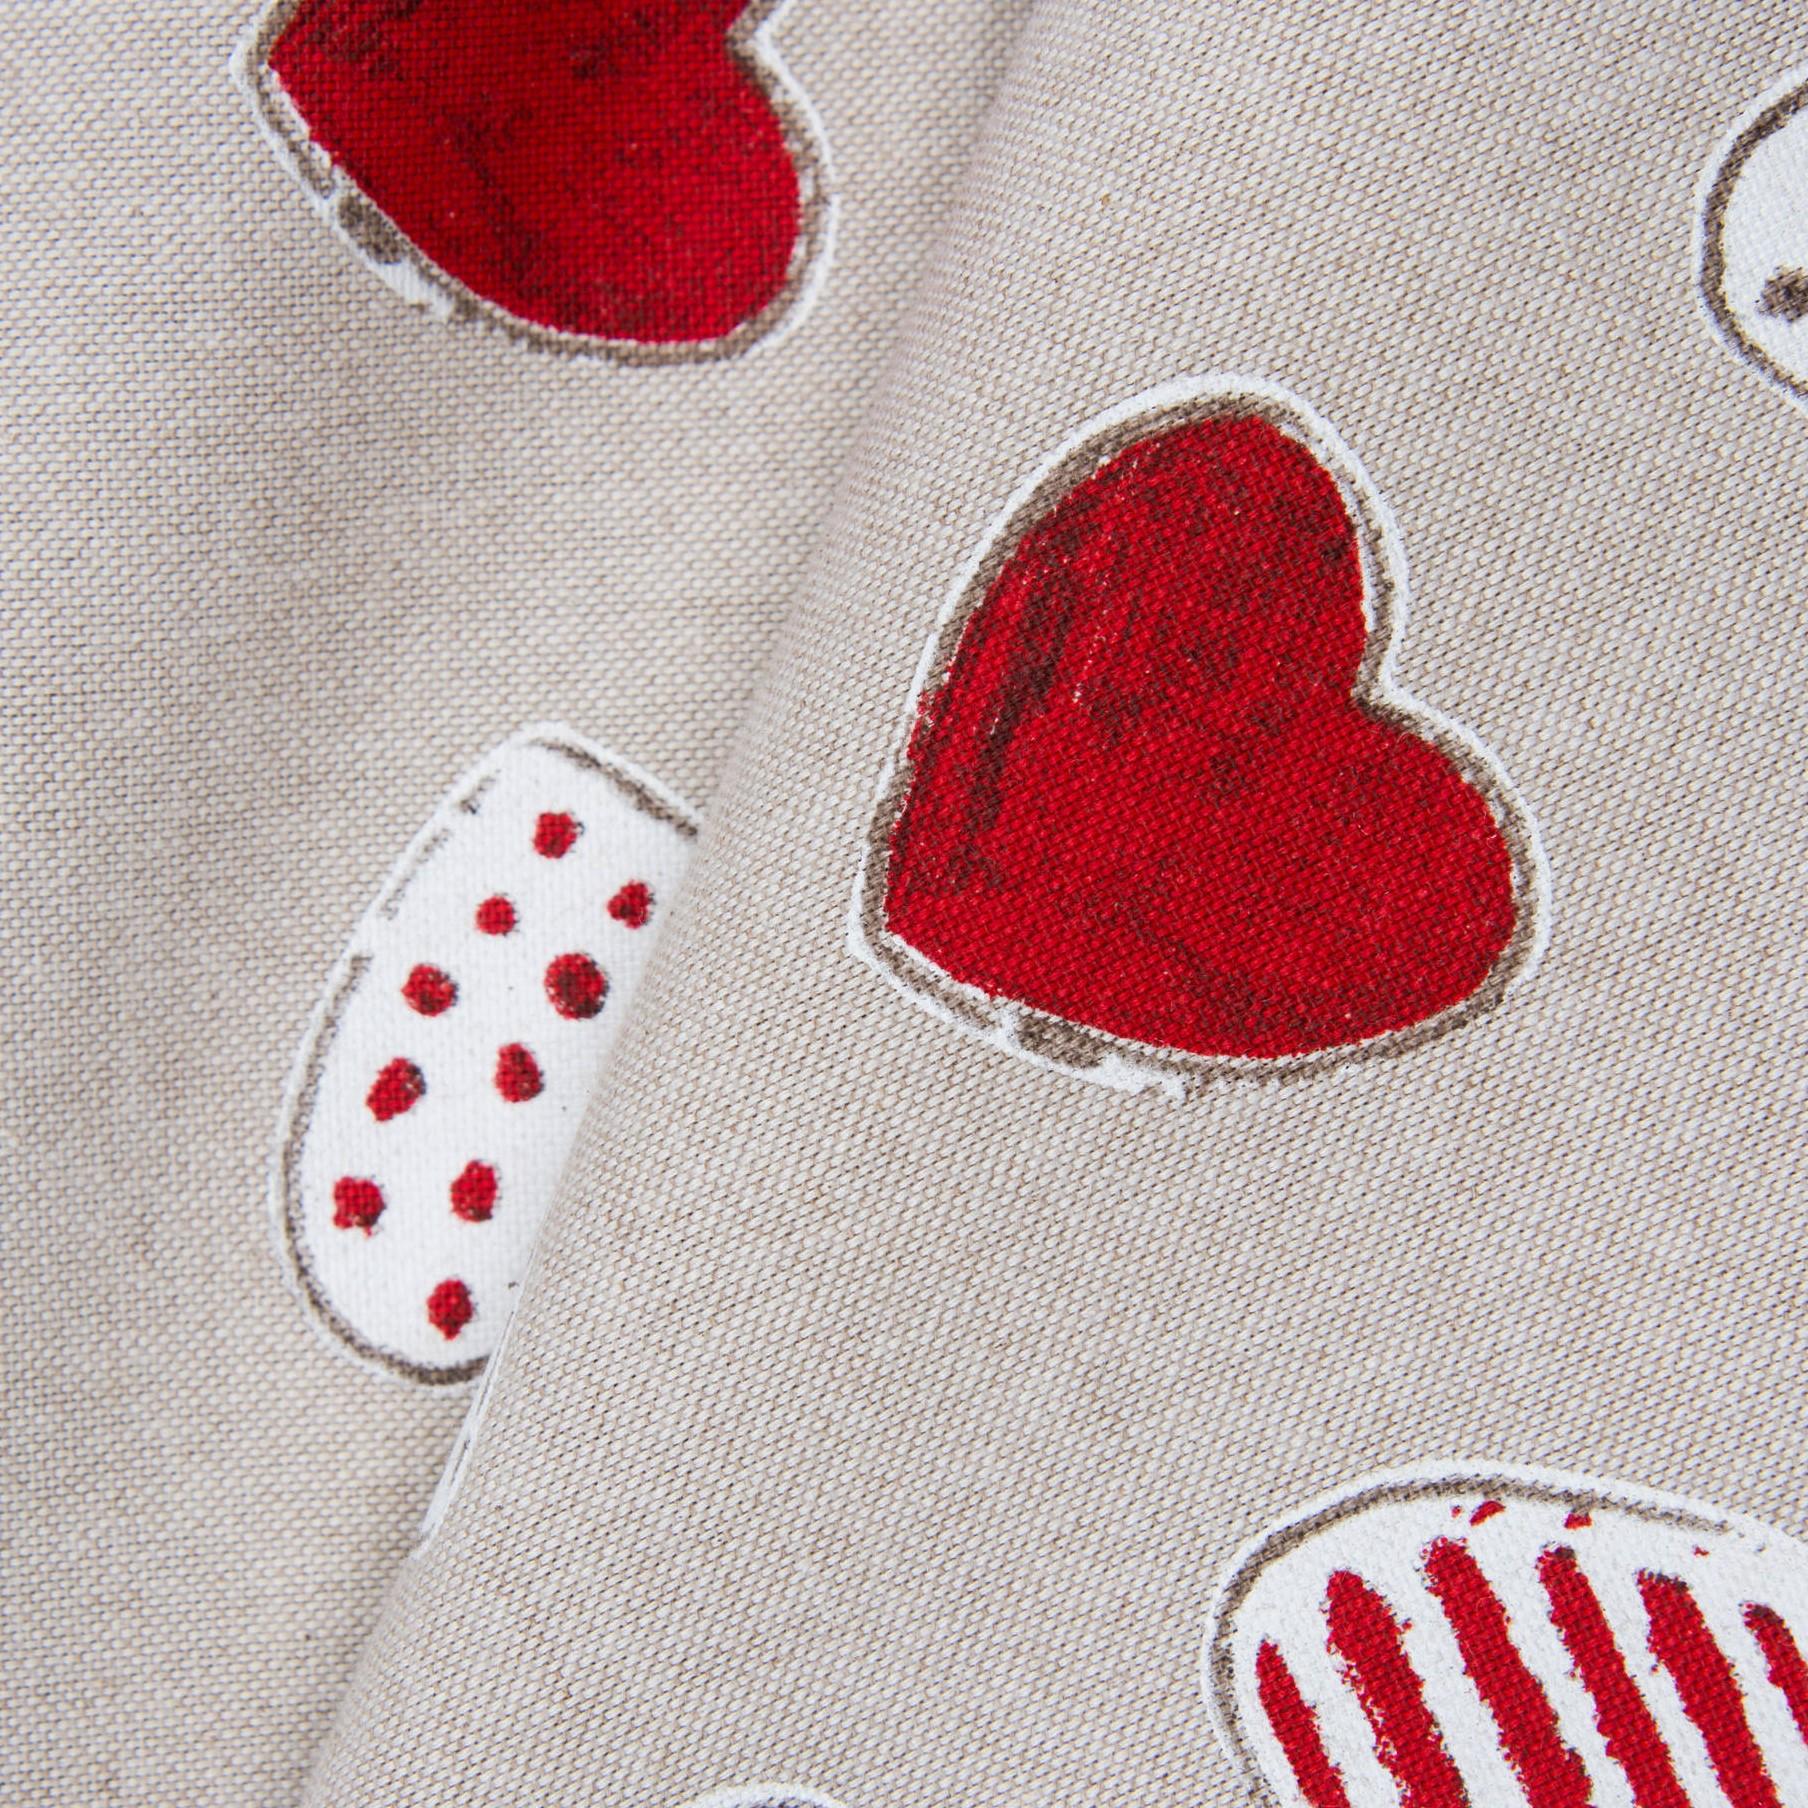 Ткань Сердечки, хлопок 85%, плотность 200, 55х70 см